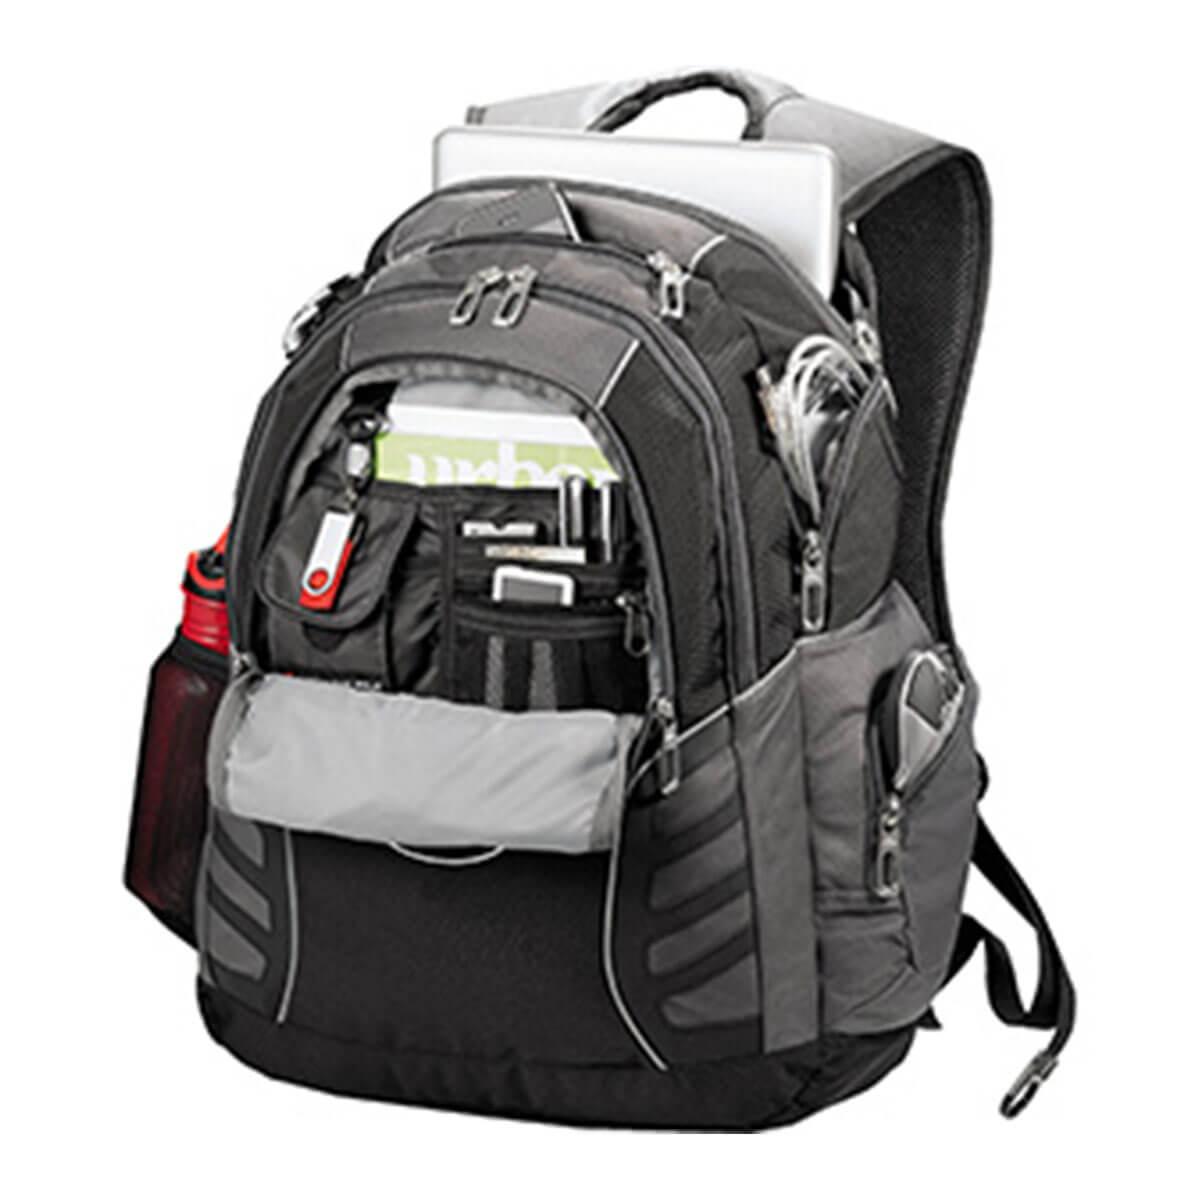 High Sierra Swerve Big Wig 17 in Computer Backpack